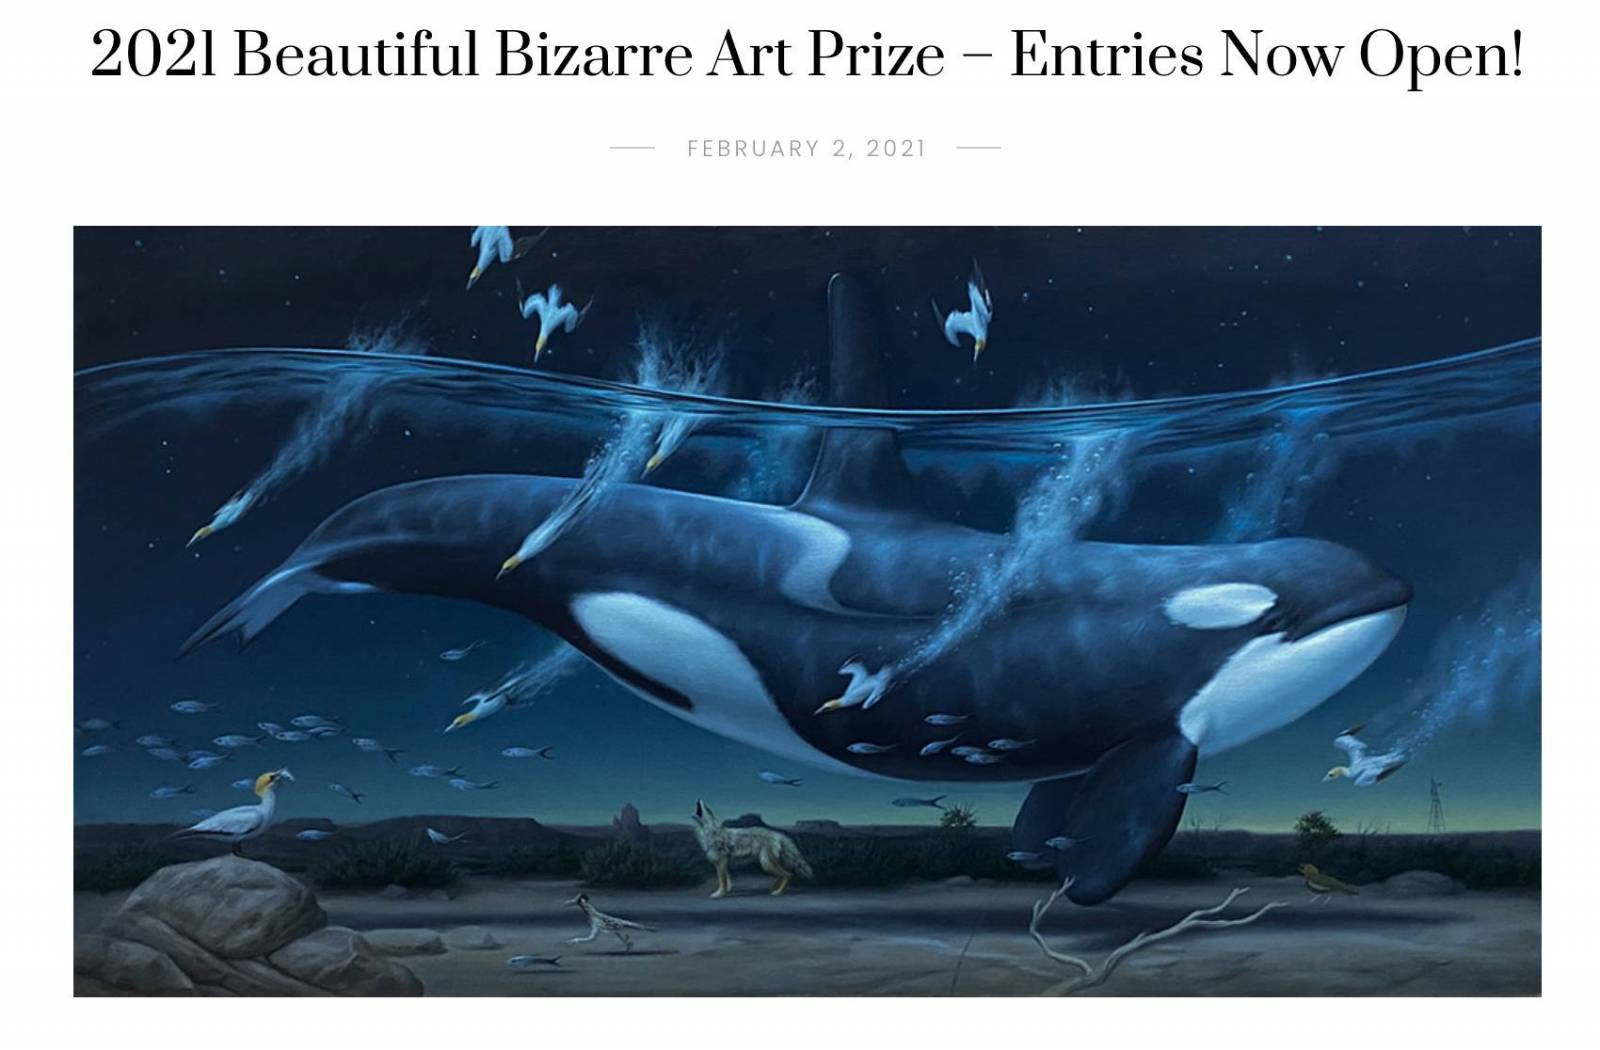 Enter the Beautiful Bizarre Art Prize